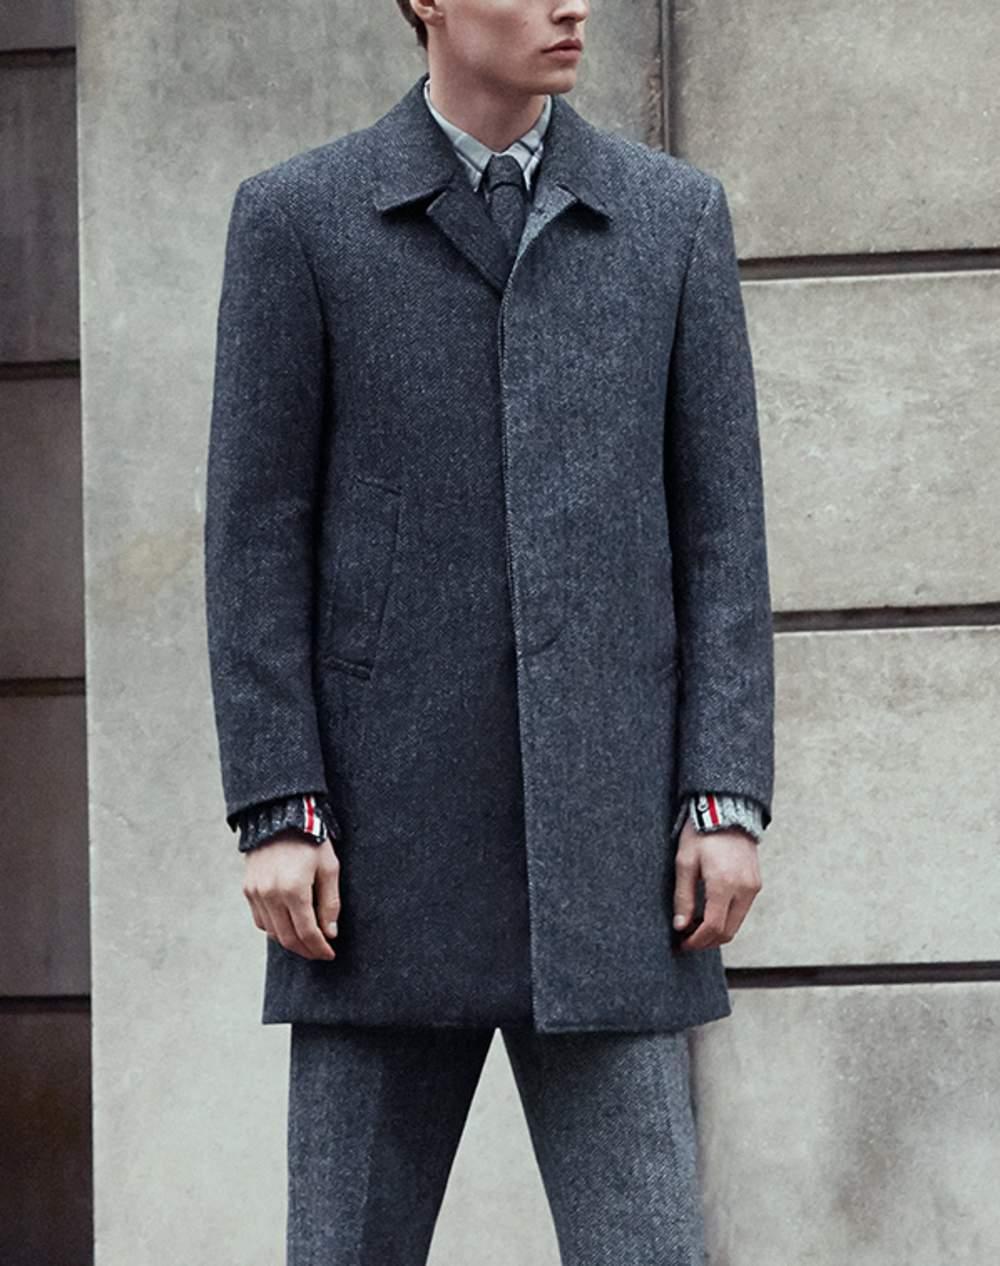 d4bc662bfdd Thom Browne Herringbone Wool-Tweed Overcoat